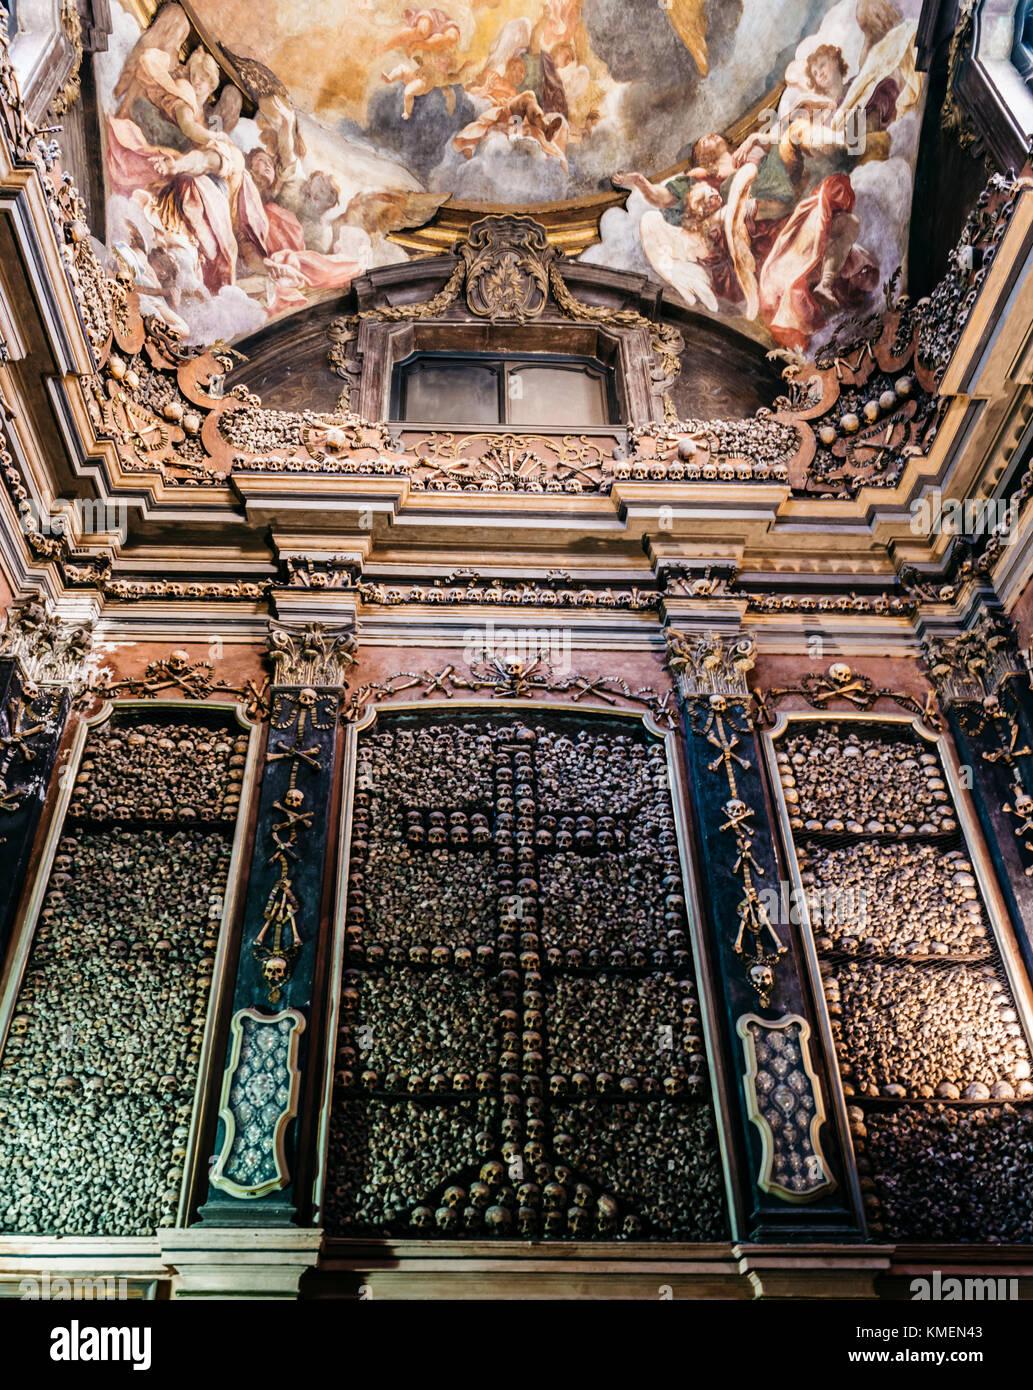 the-evocative-crypt-of-san-bernardino-alle-ossa-milan-italy-KMEN43.jpg